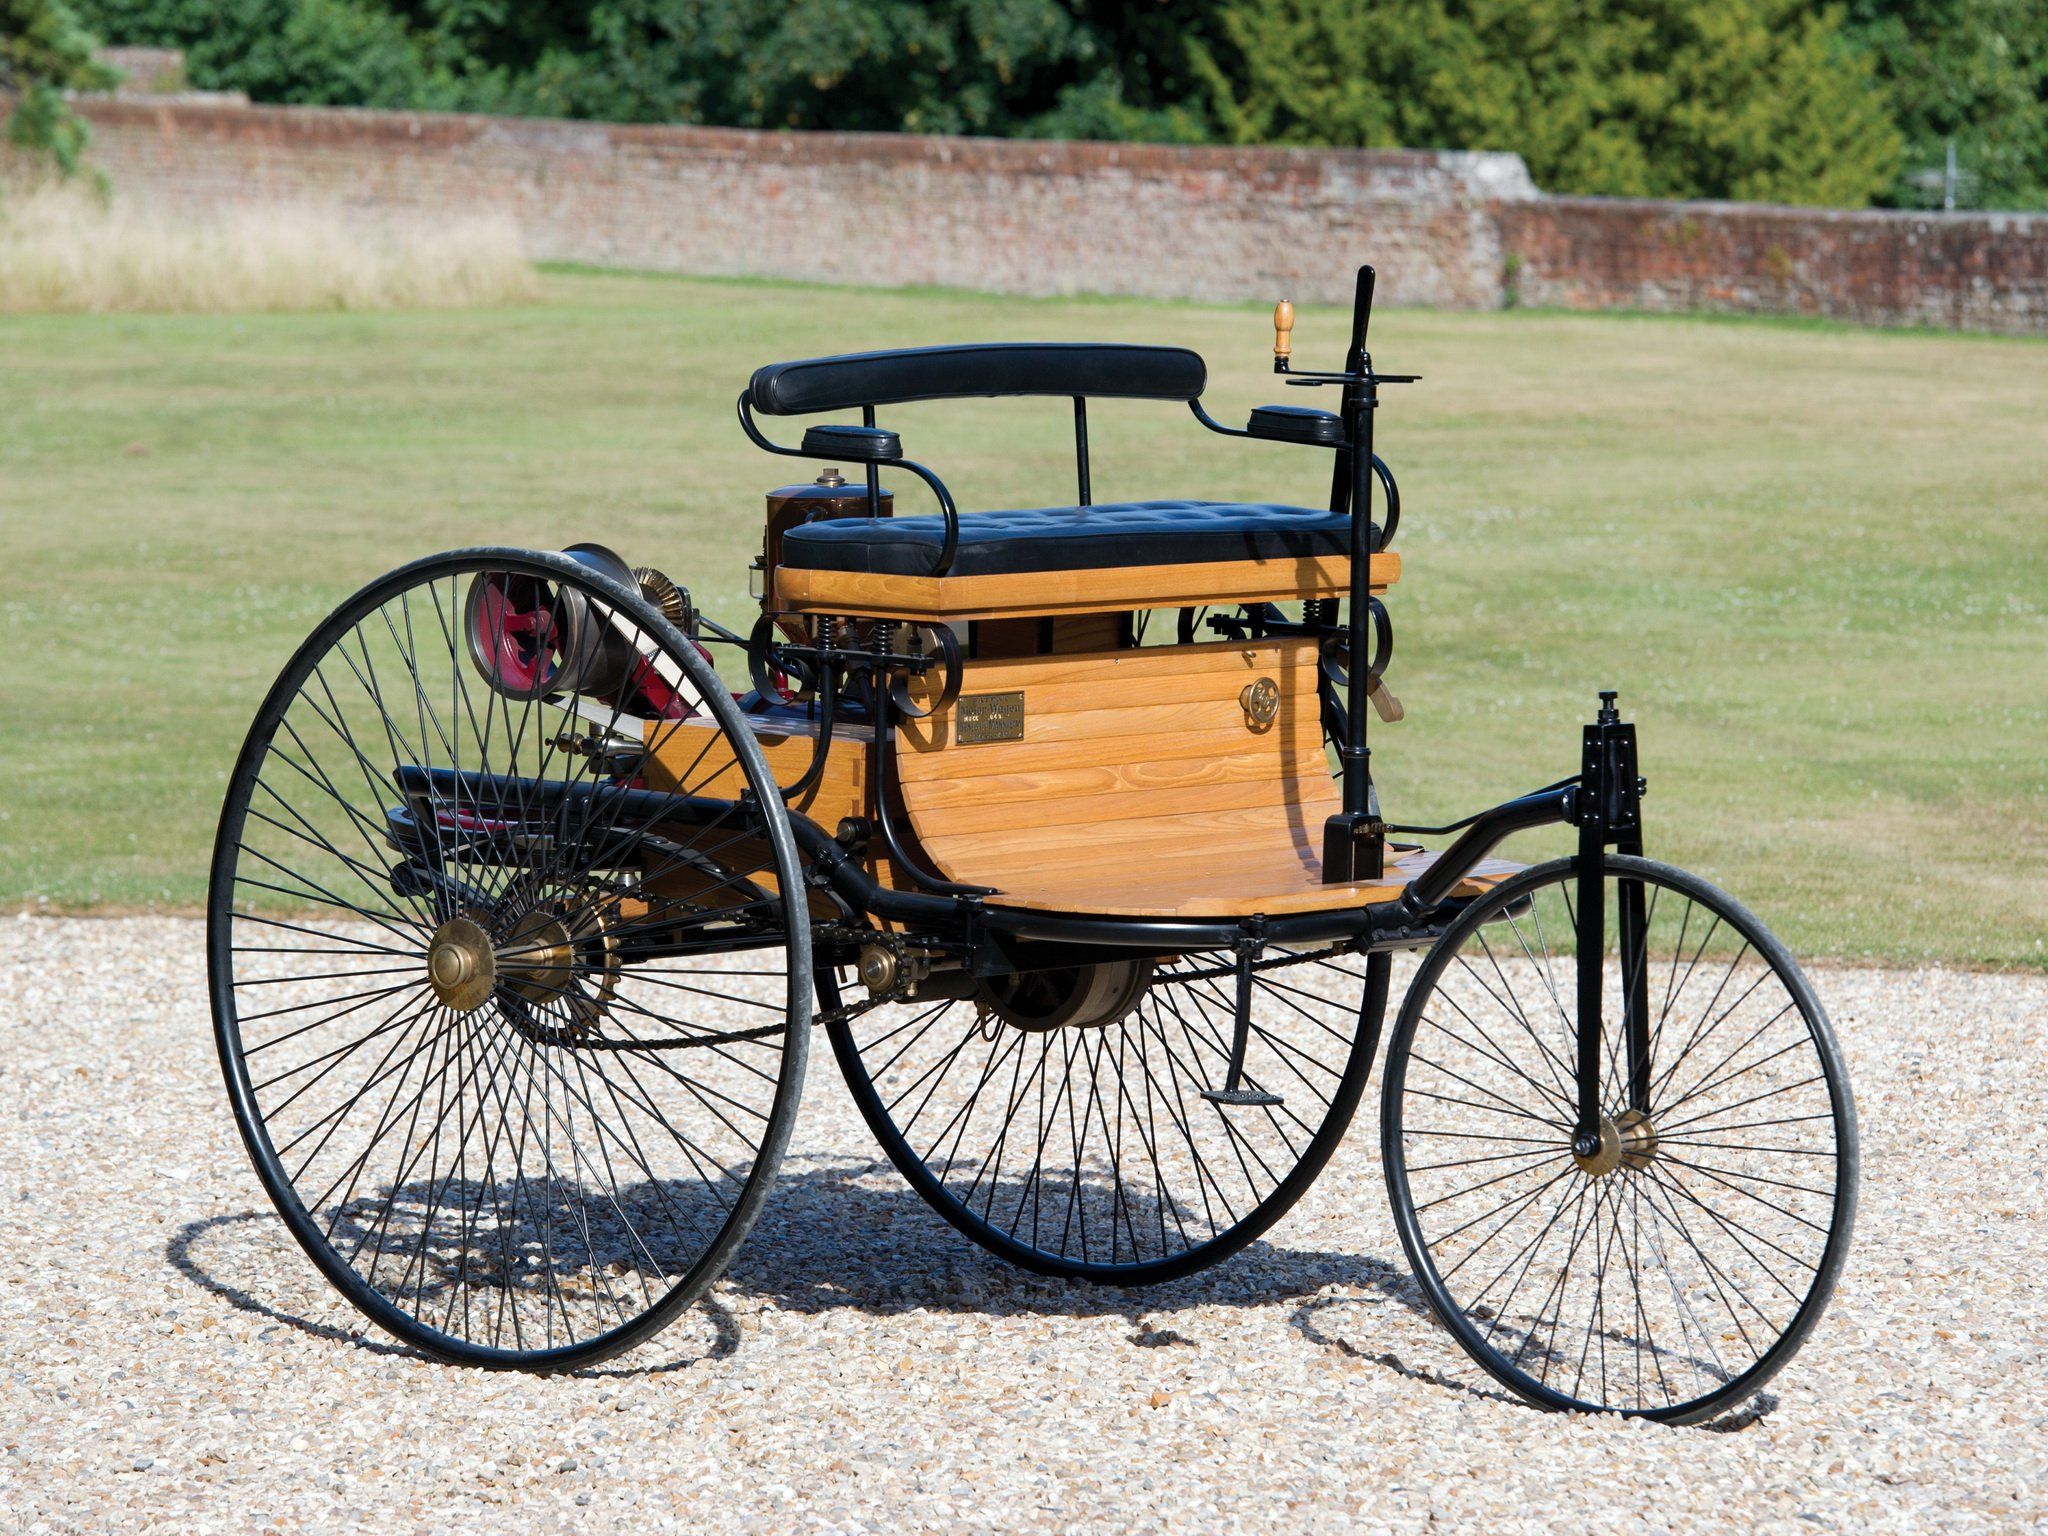 1885 benz patent motorwagen typ i retro wallpaper 2048x1536 452752 wallpaperup. Black Bedroom Furniture Sets. Home Design Ideas